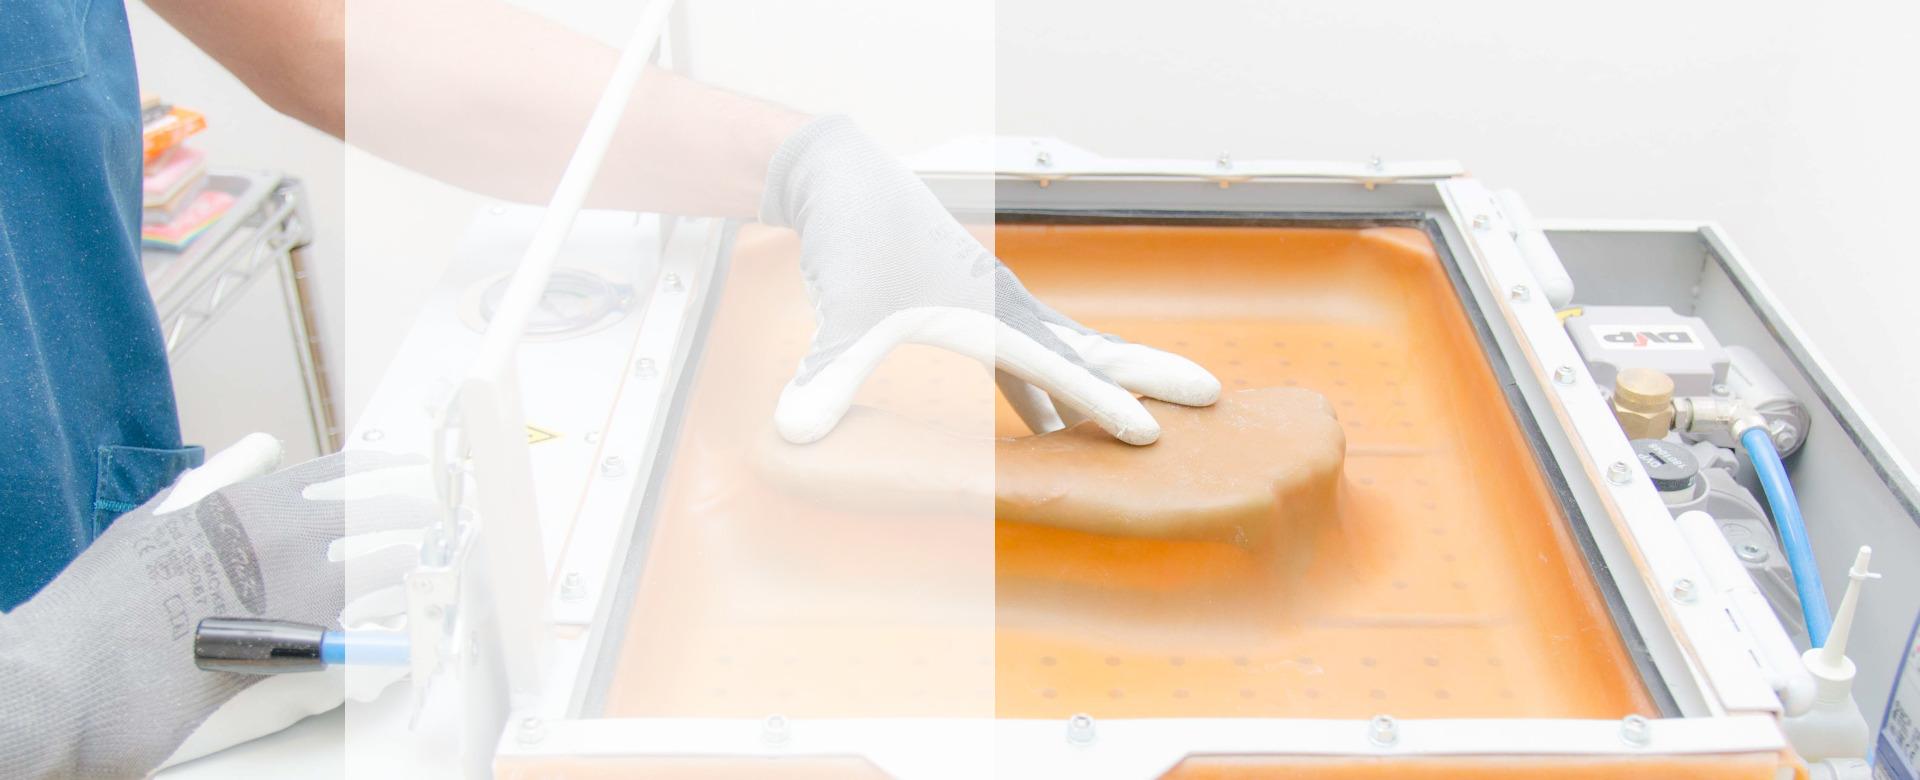 plantari-novi-ligure-ortopedia